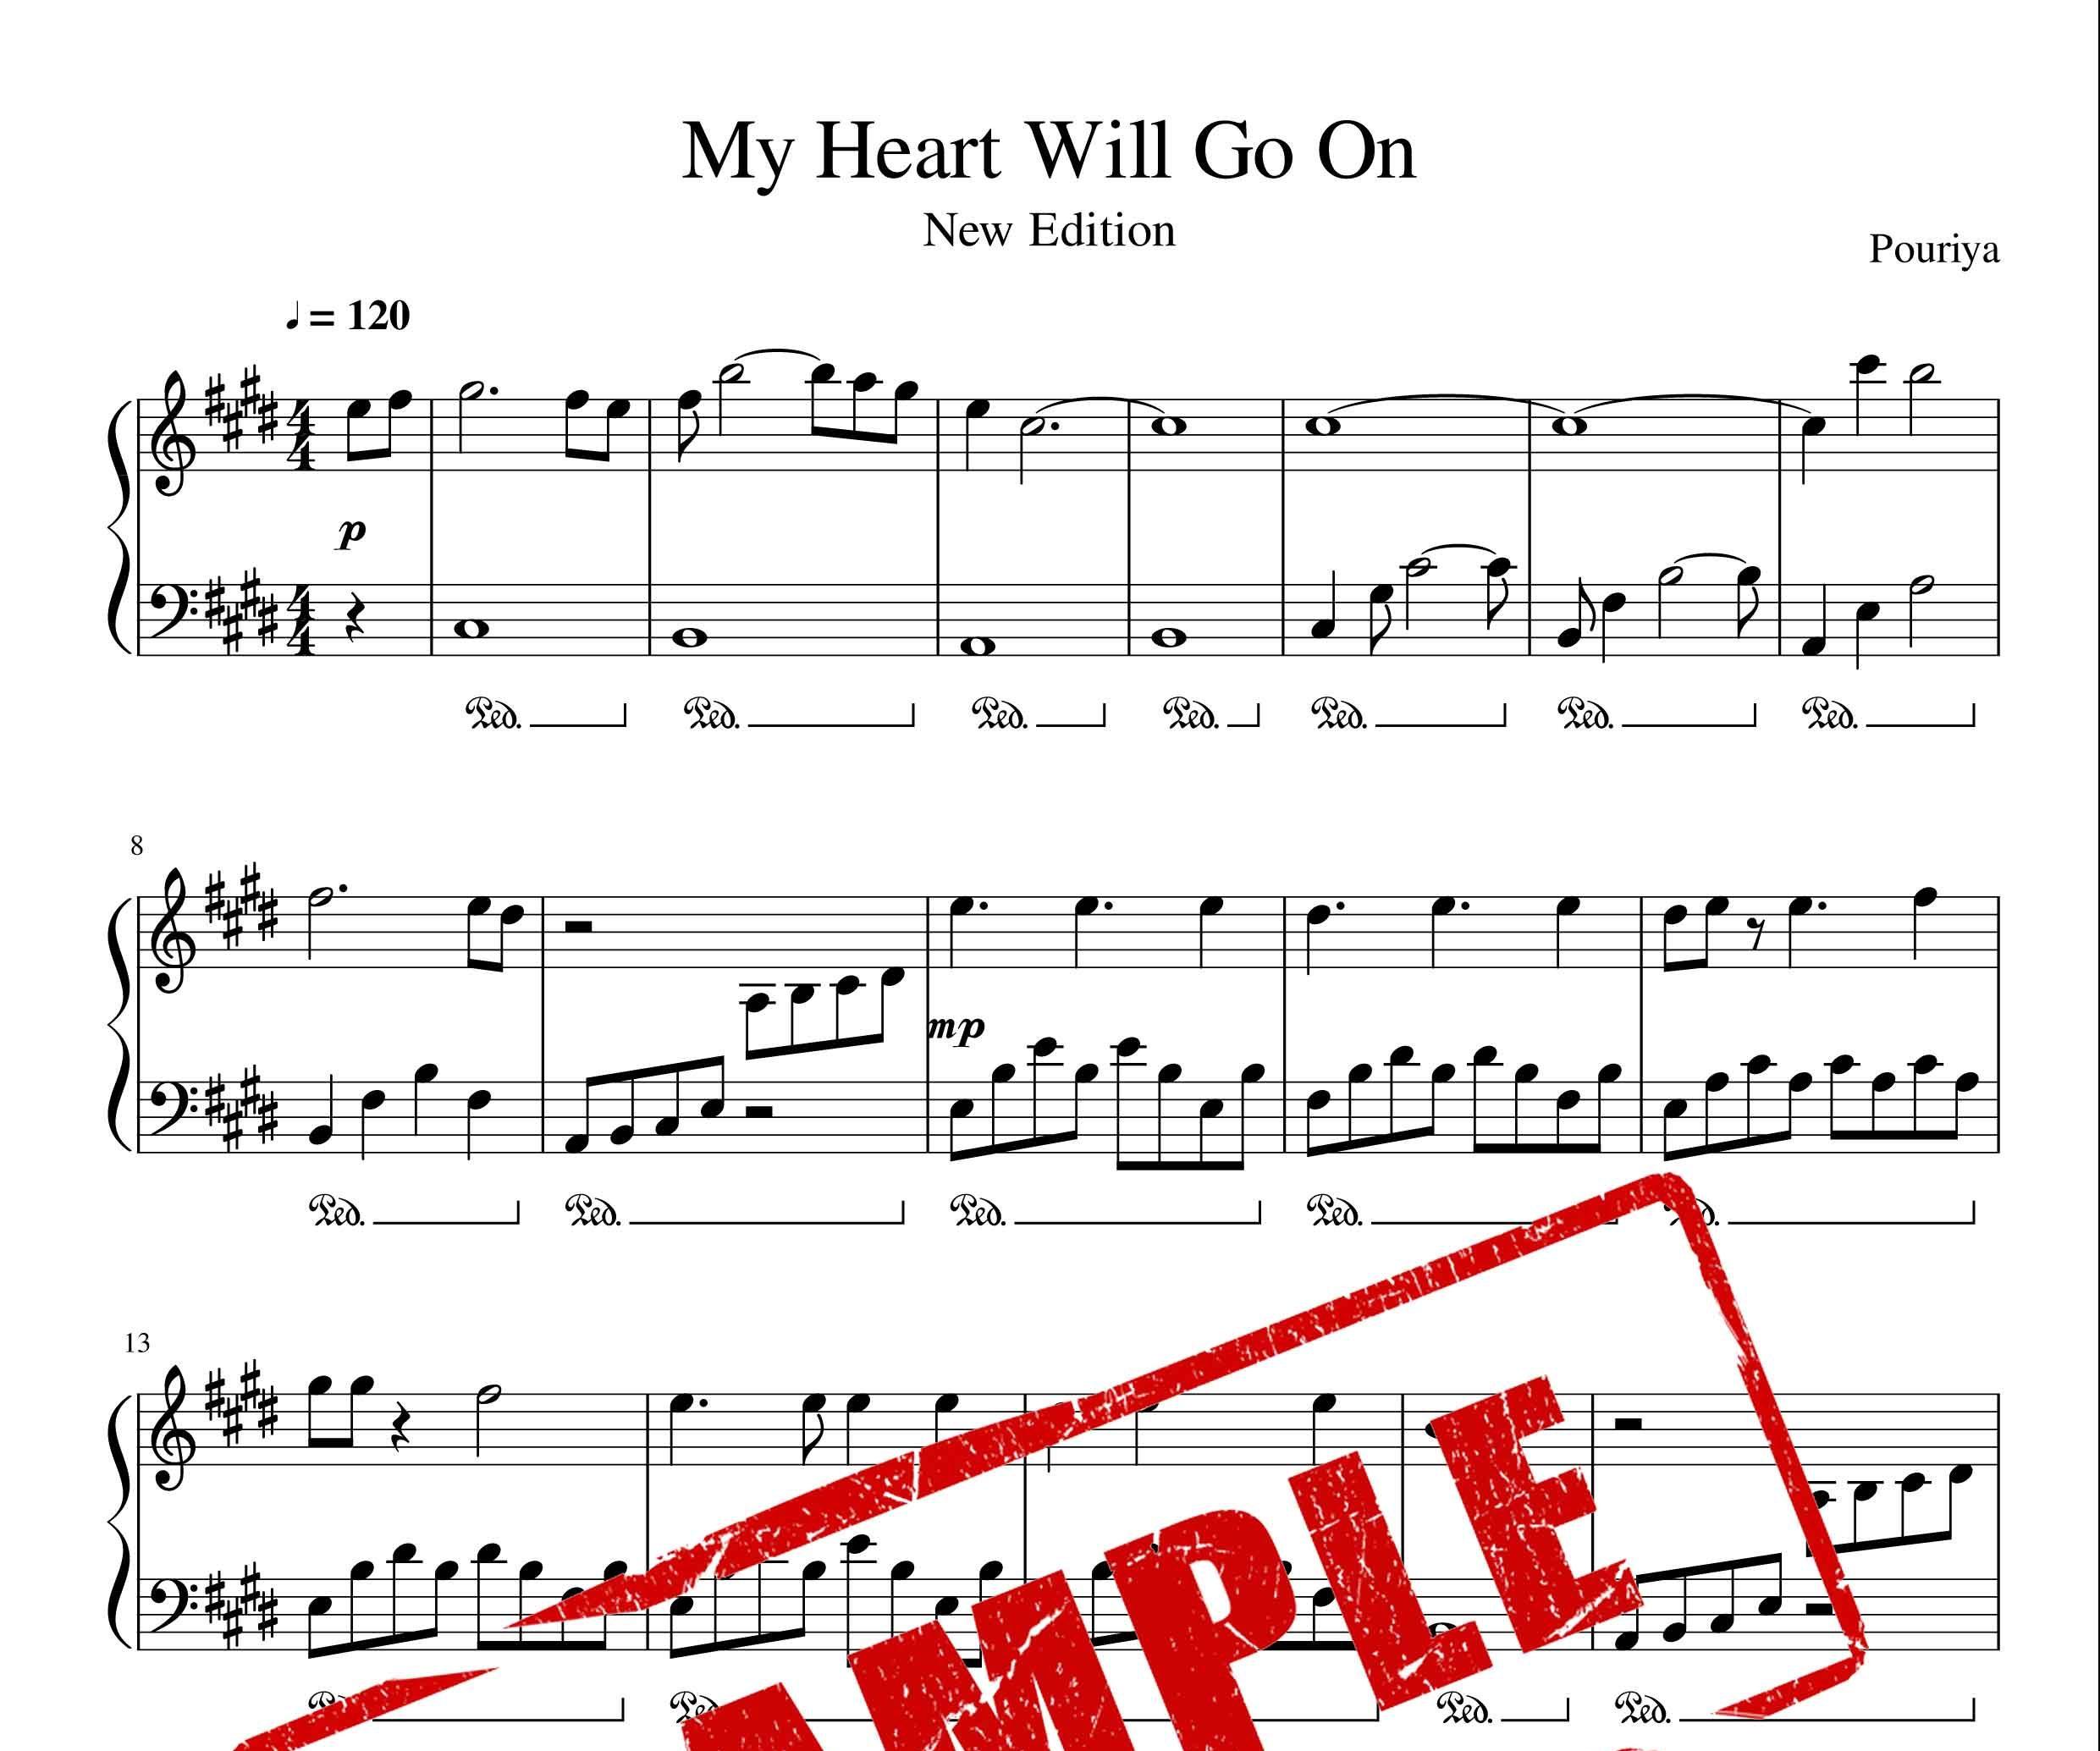 نت پیانو My Heart Will Go On فیلم تایتانیک